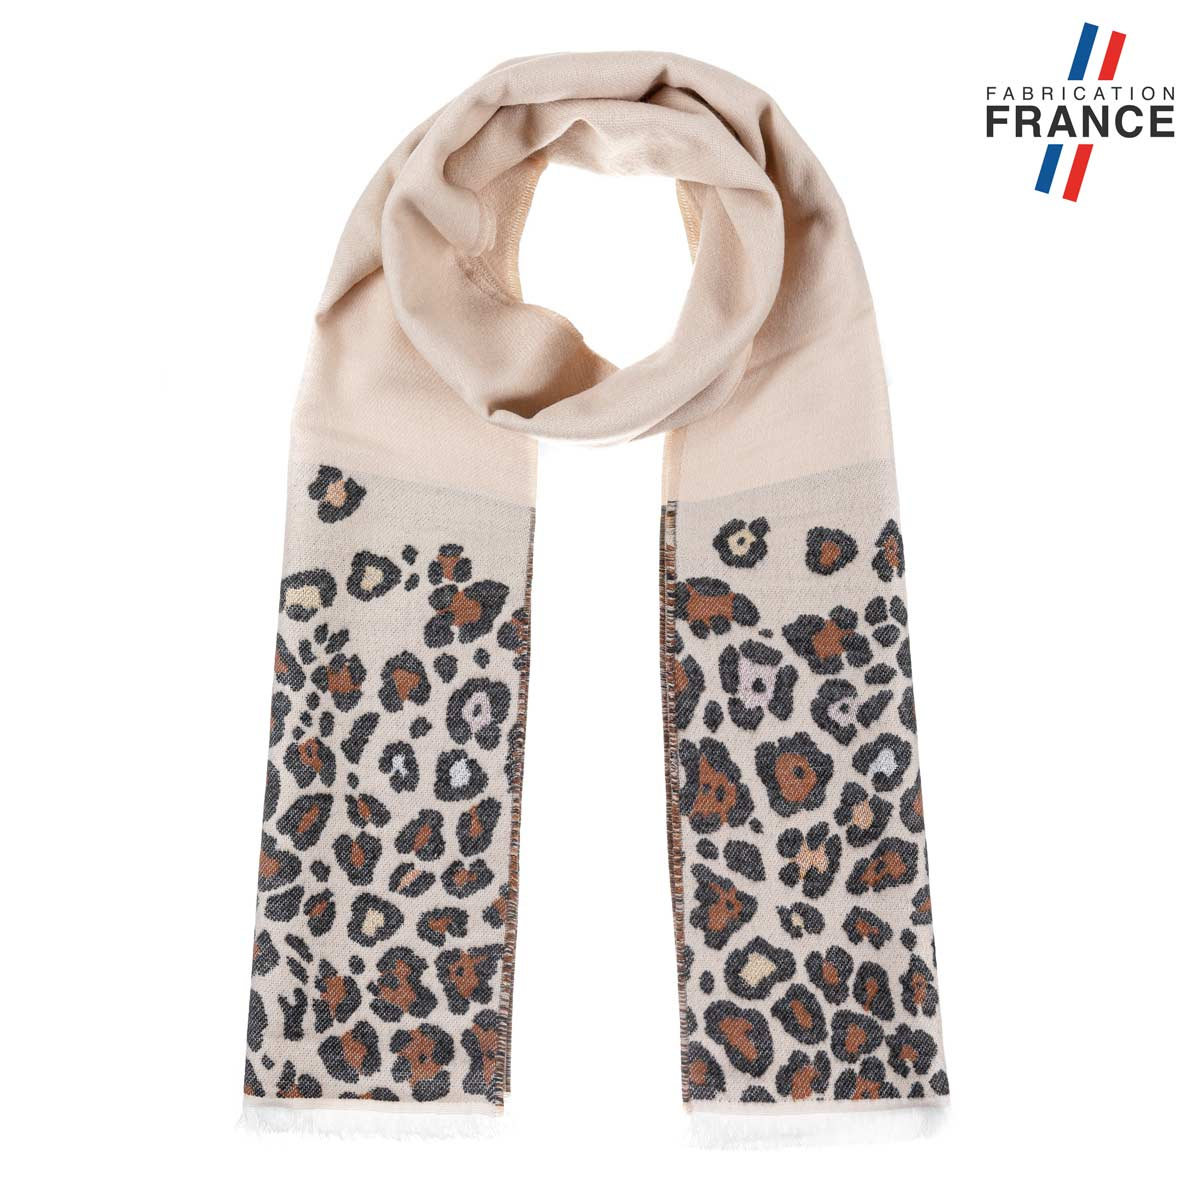 AT-06243-F12-LB_FR-echarpe-fabriquee-en-france-beige-leopard